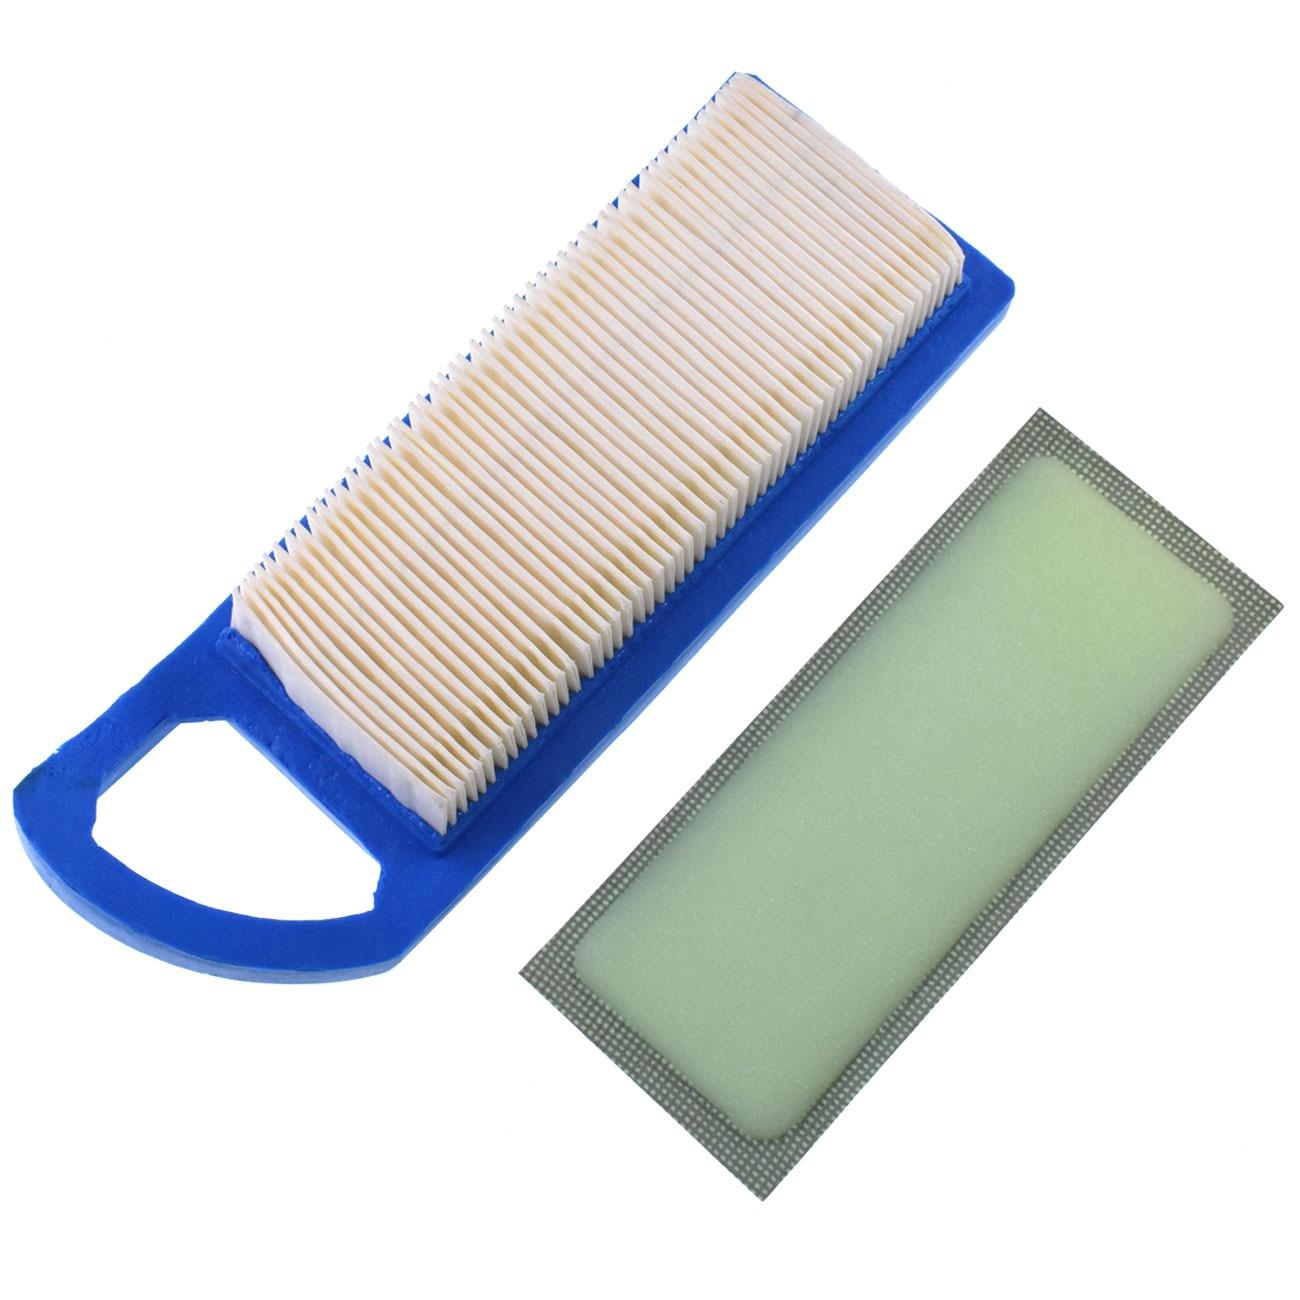 Air Filter W/Pre-Filter For Briggs & Stratton 697153 795115 794422 698083 697015